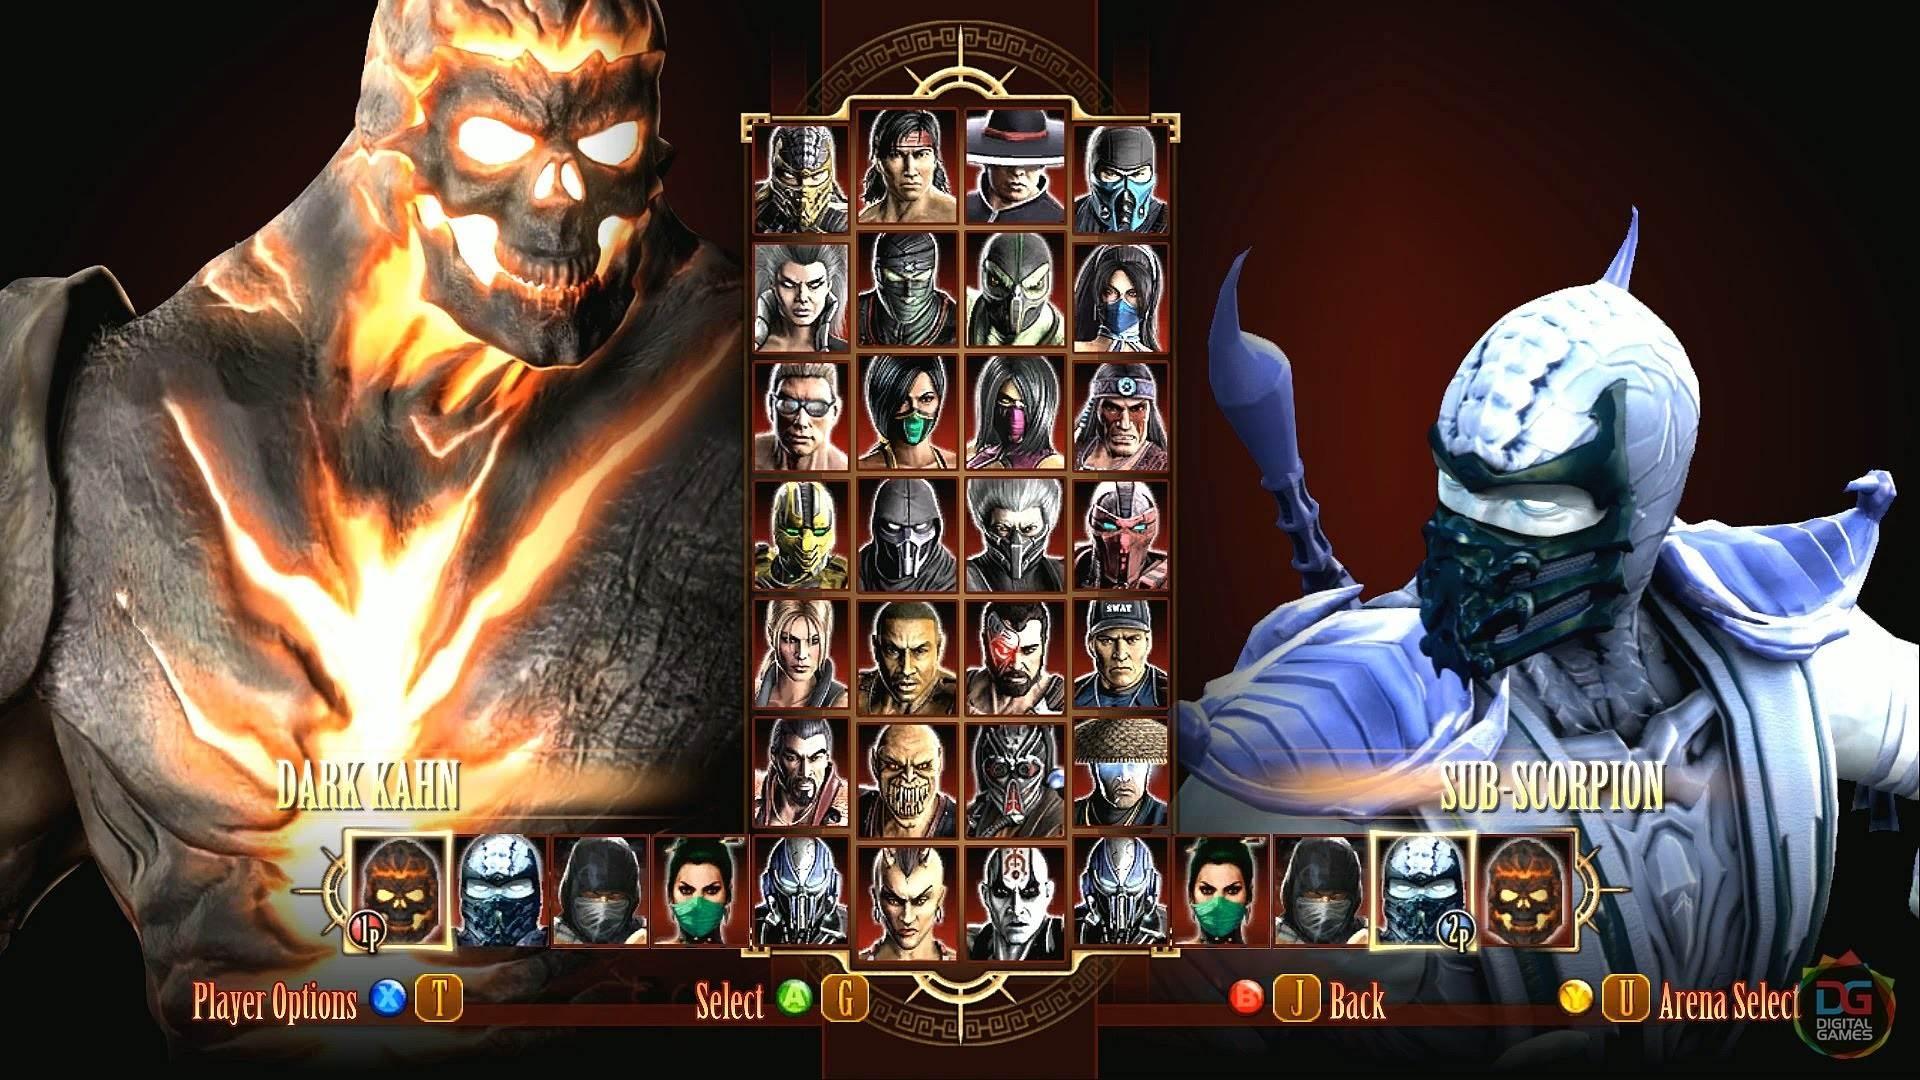 Mortal Kombat Sub Zero And Kitana Wallpaper 1920x1080